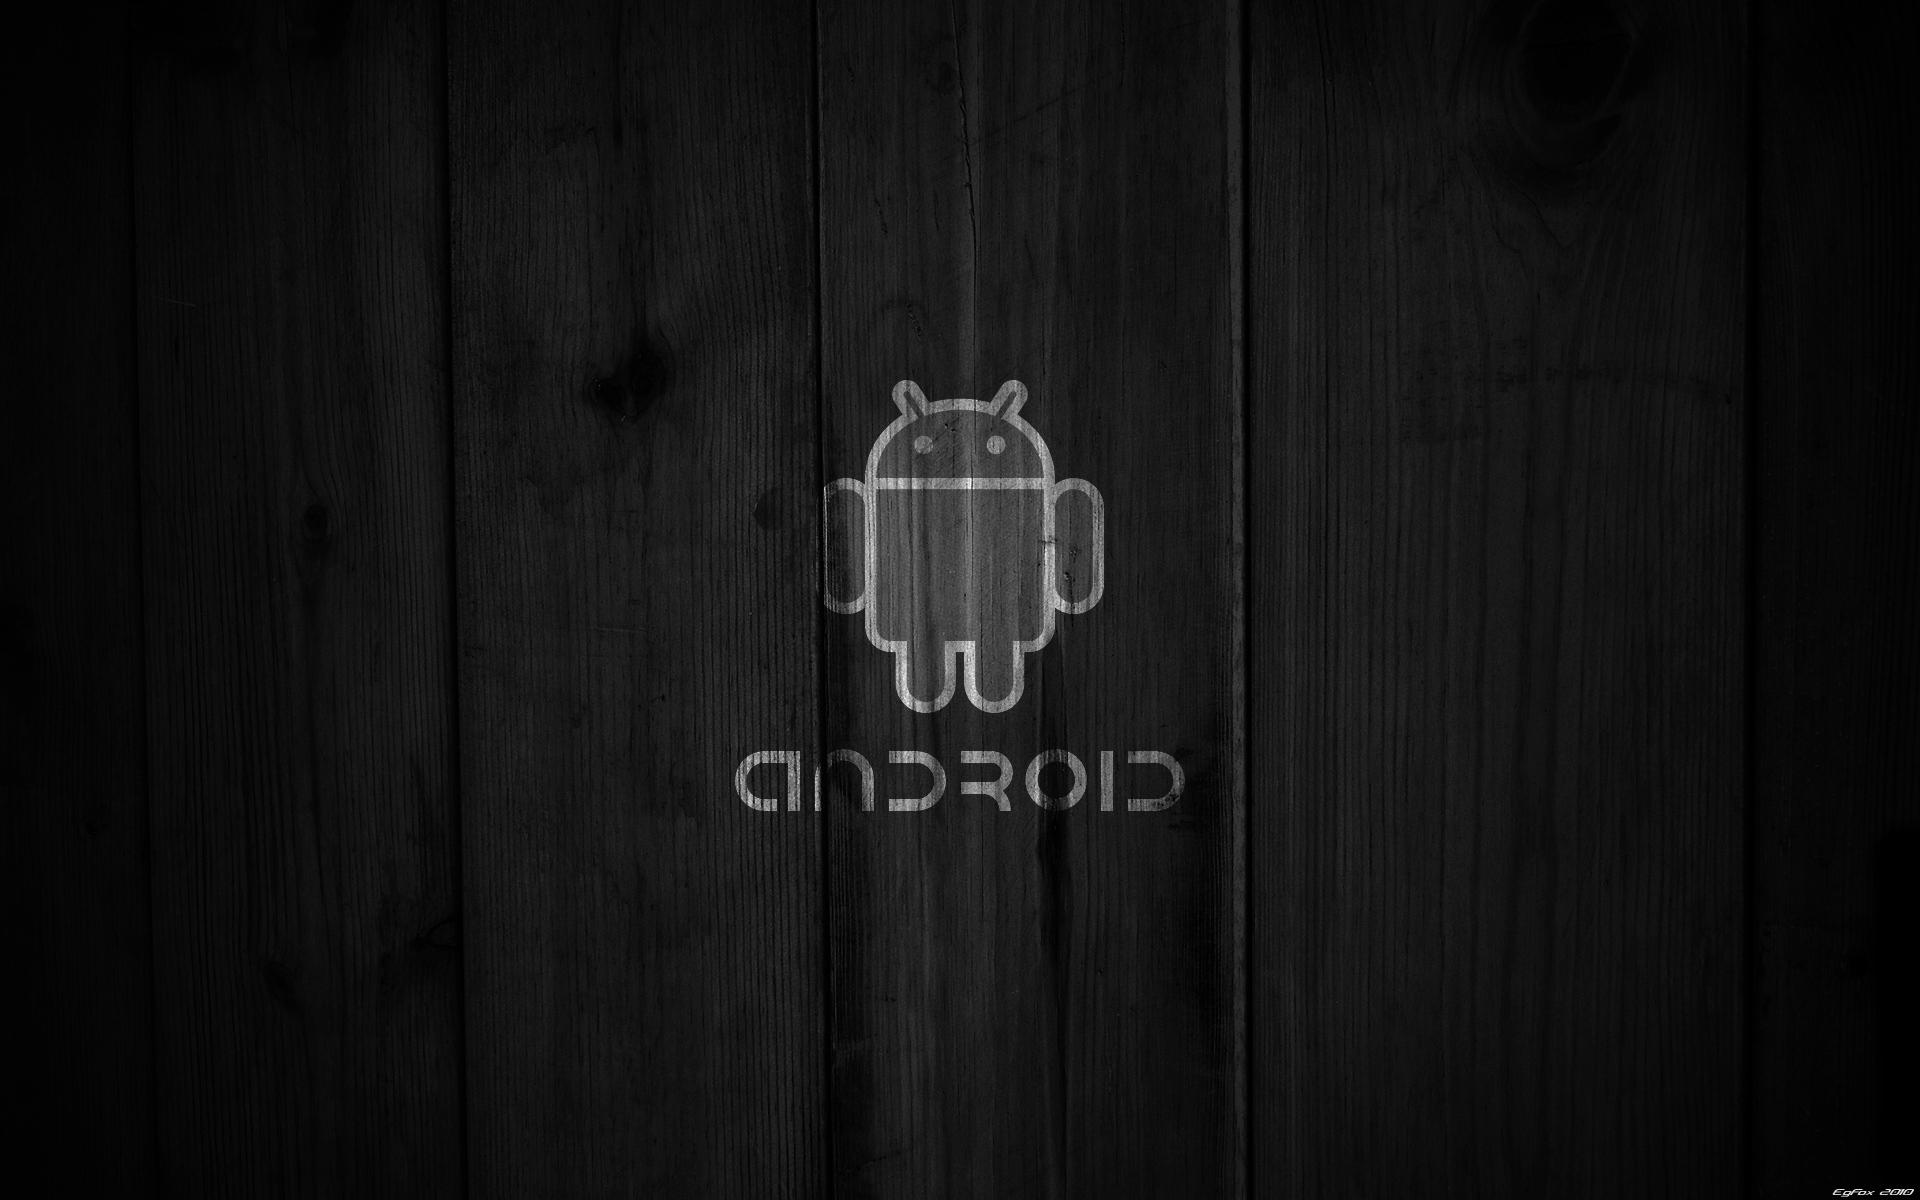 egfox androidwood hd 2010 by eg art d2y58wn Mükemmel HD Resimler